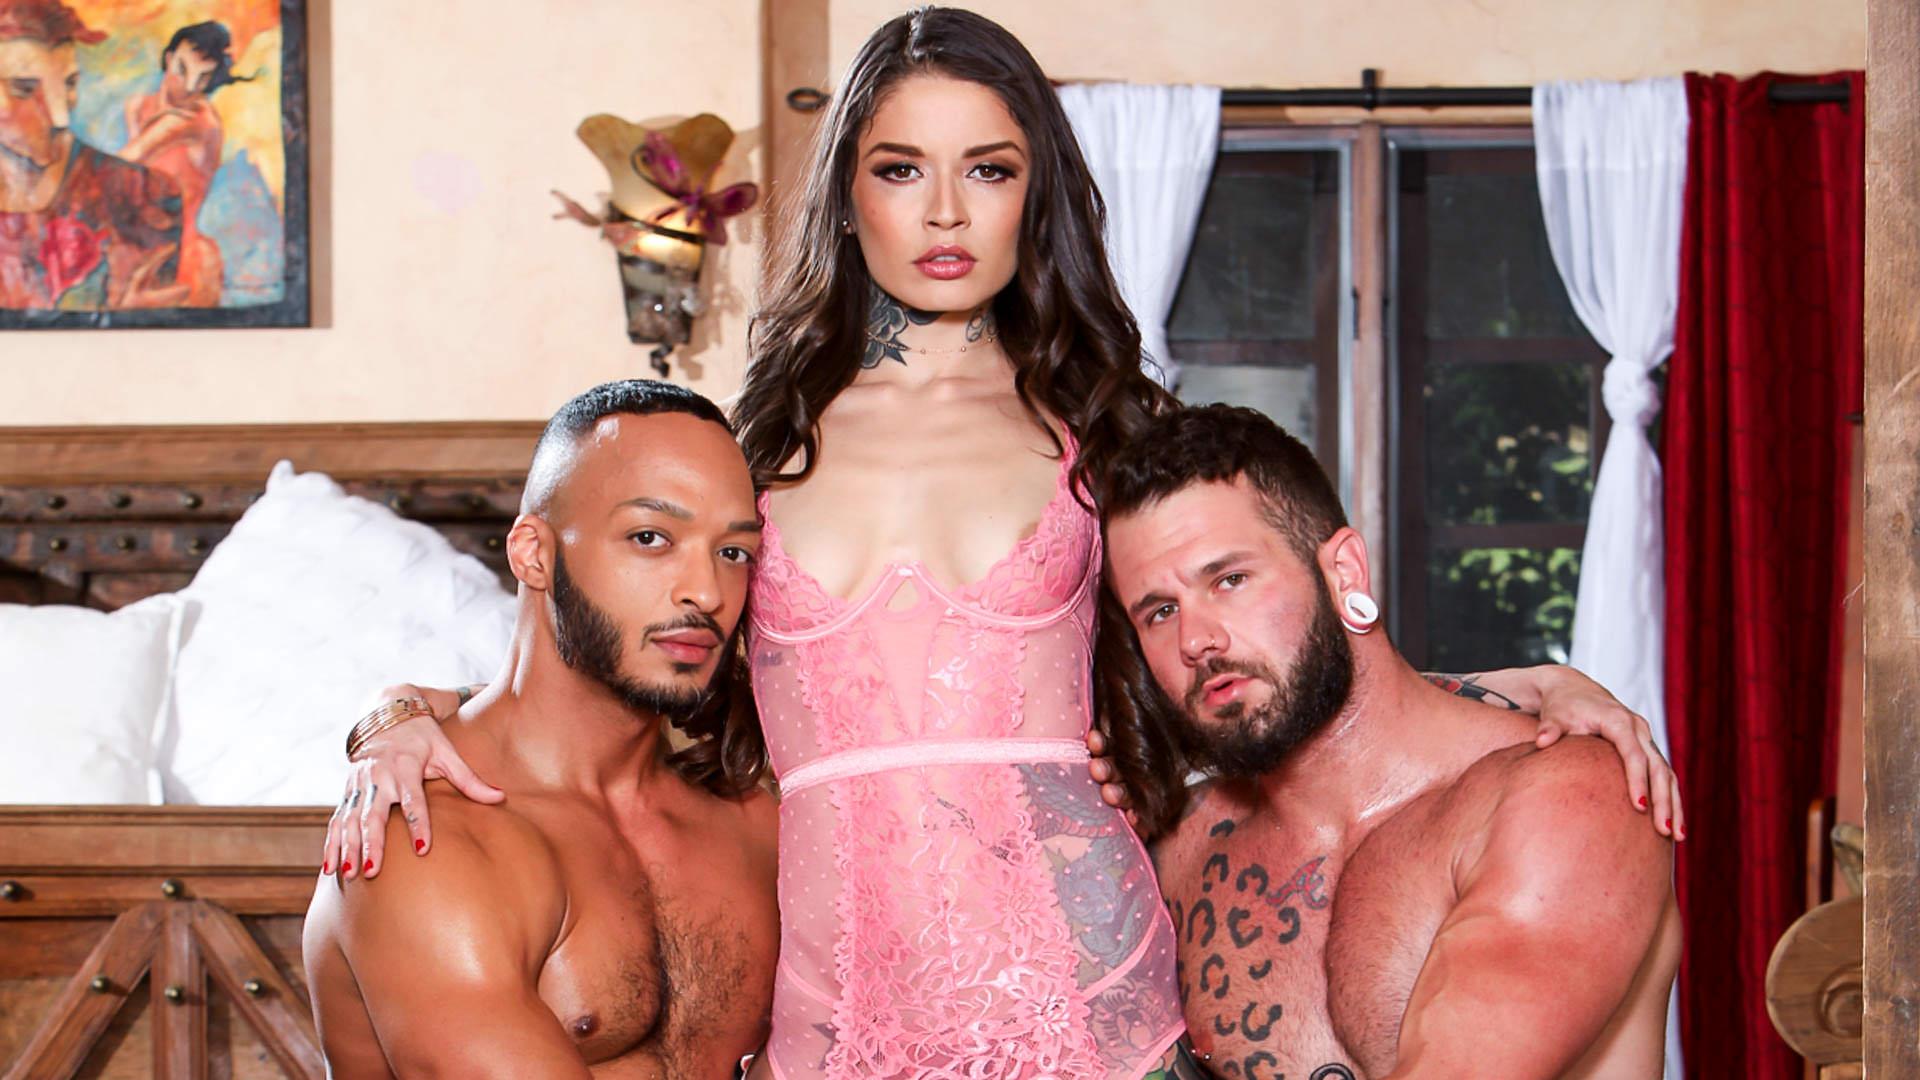 Bi For Now - Johnny Hill & Dillon Diaz & Vanessa Vega 1